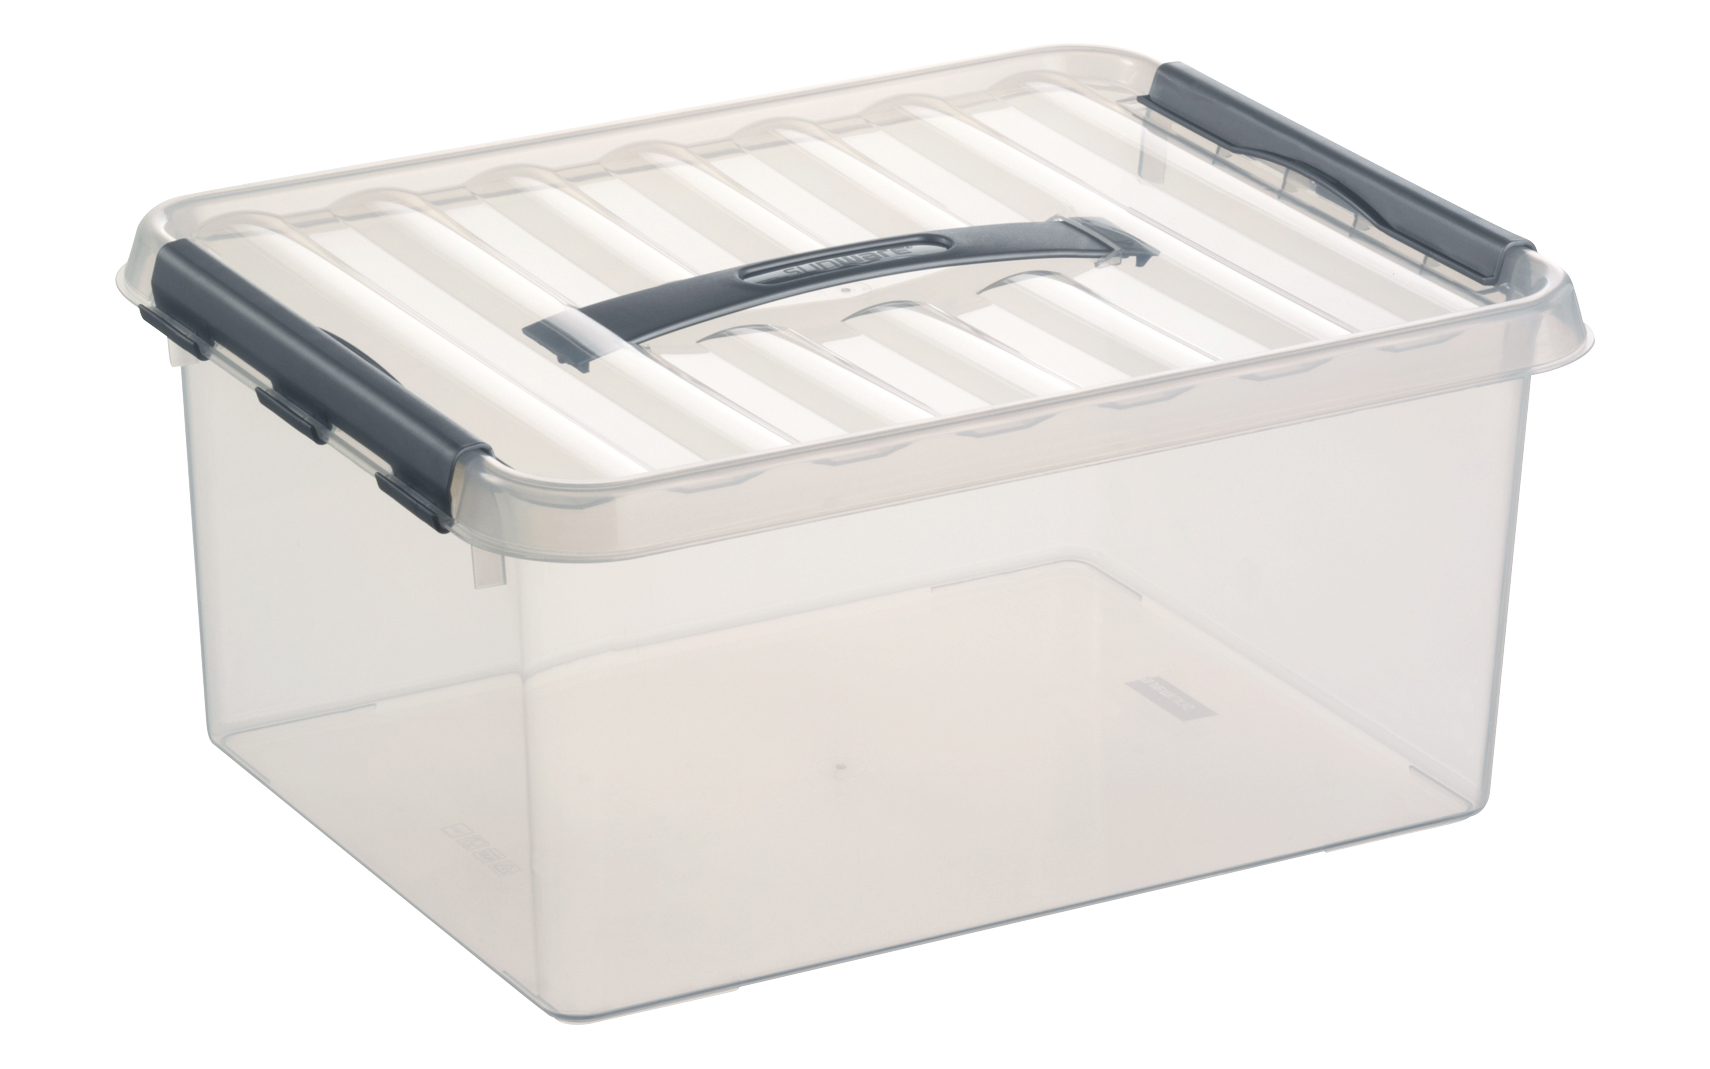 kunststoffboxen mit deckel transparent teedose 45 g mit. Black Bedroom Furniture Sets. Home Design Ideas